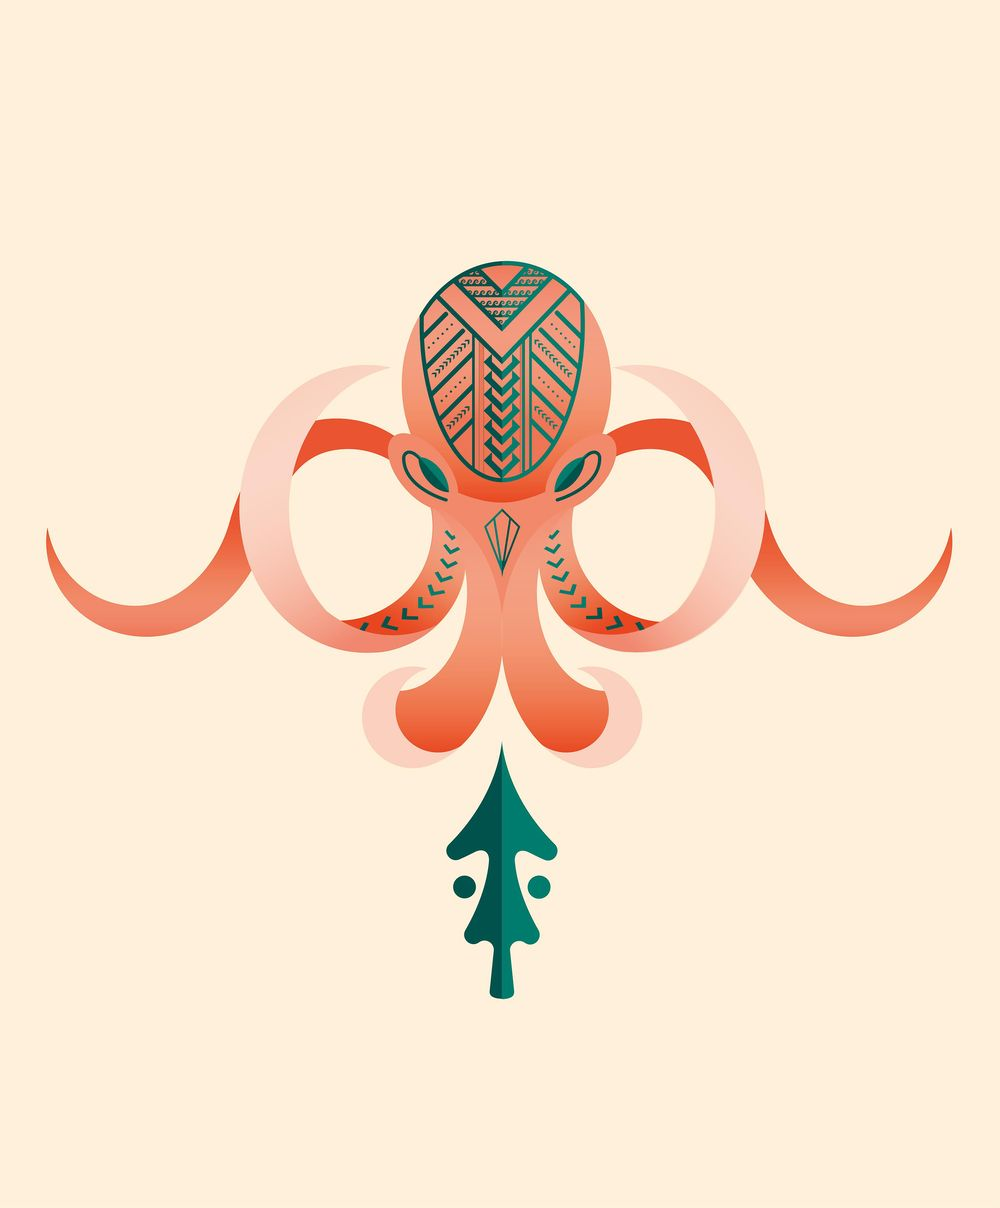 Atlantean Octopus - image 1 - student project